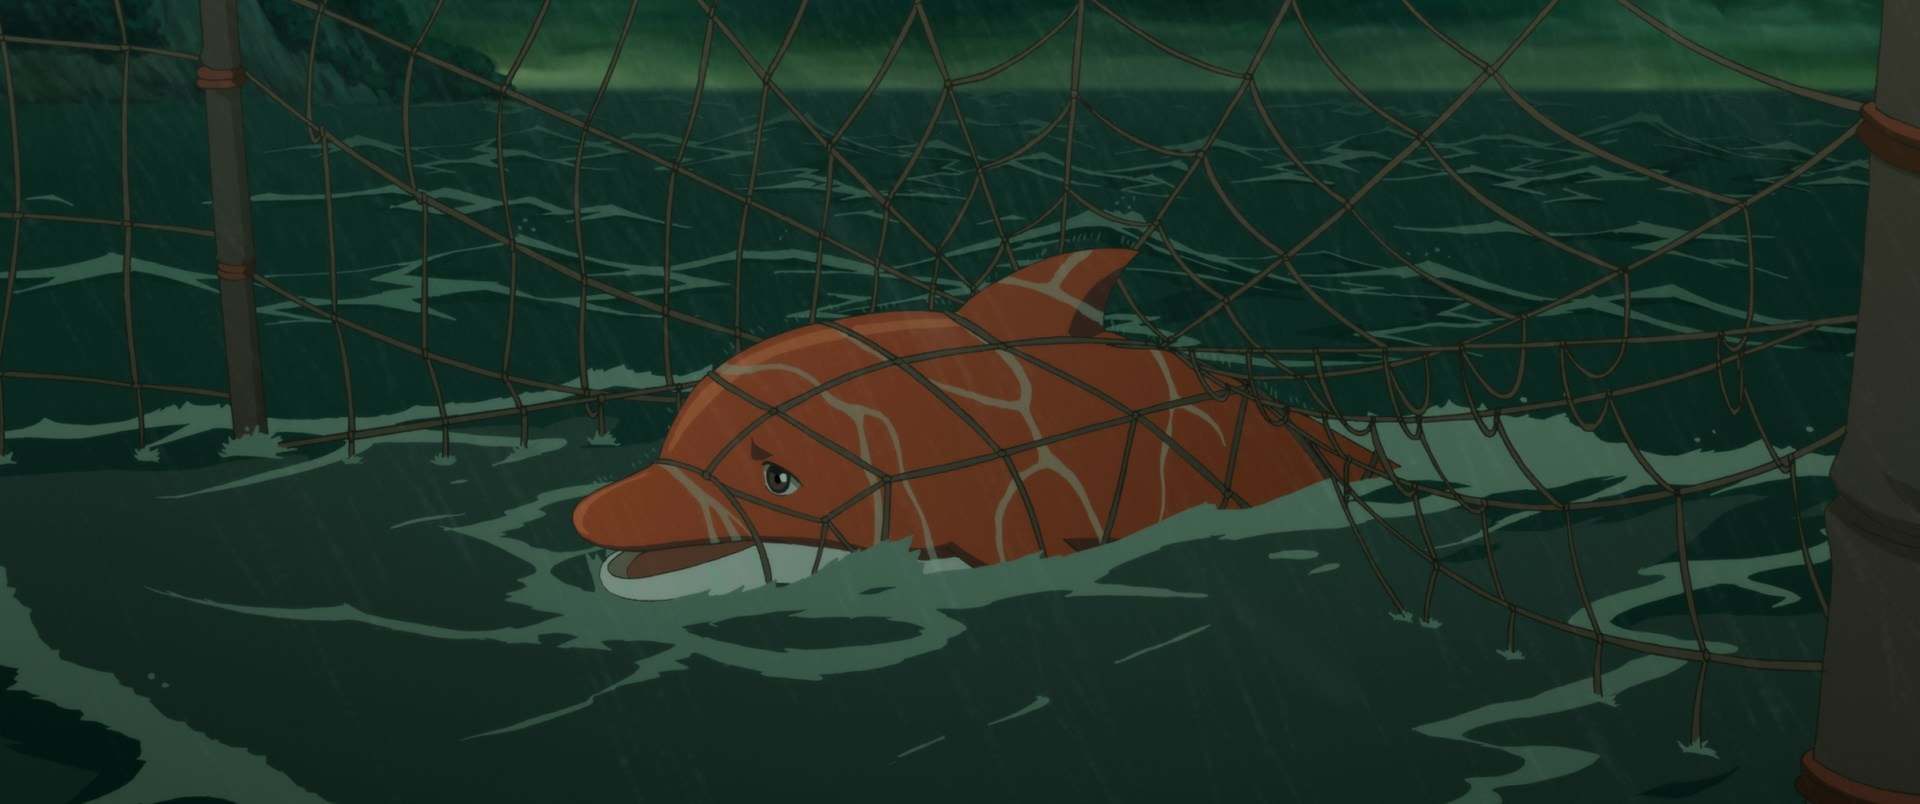 big fish & begonia full movie online